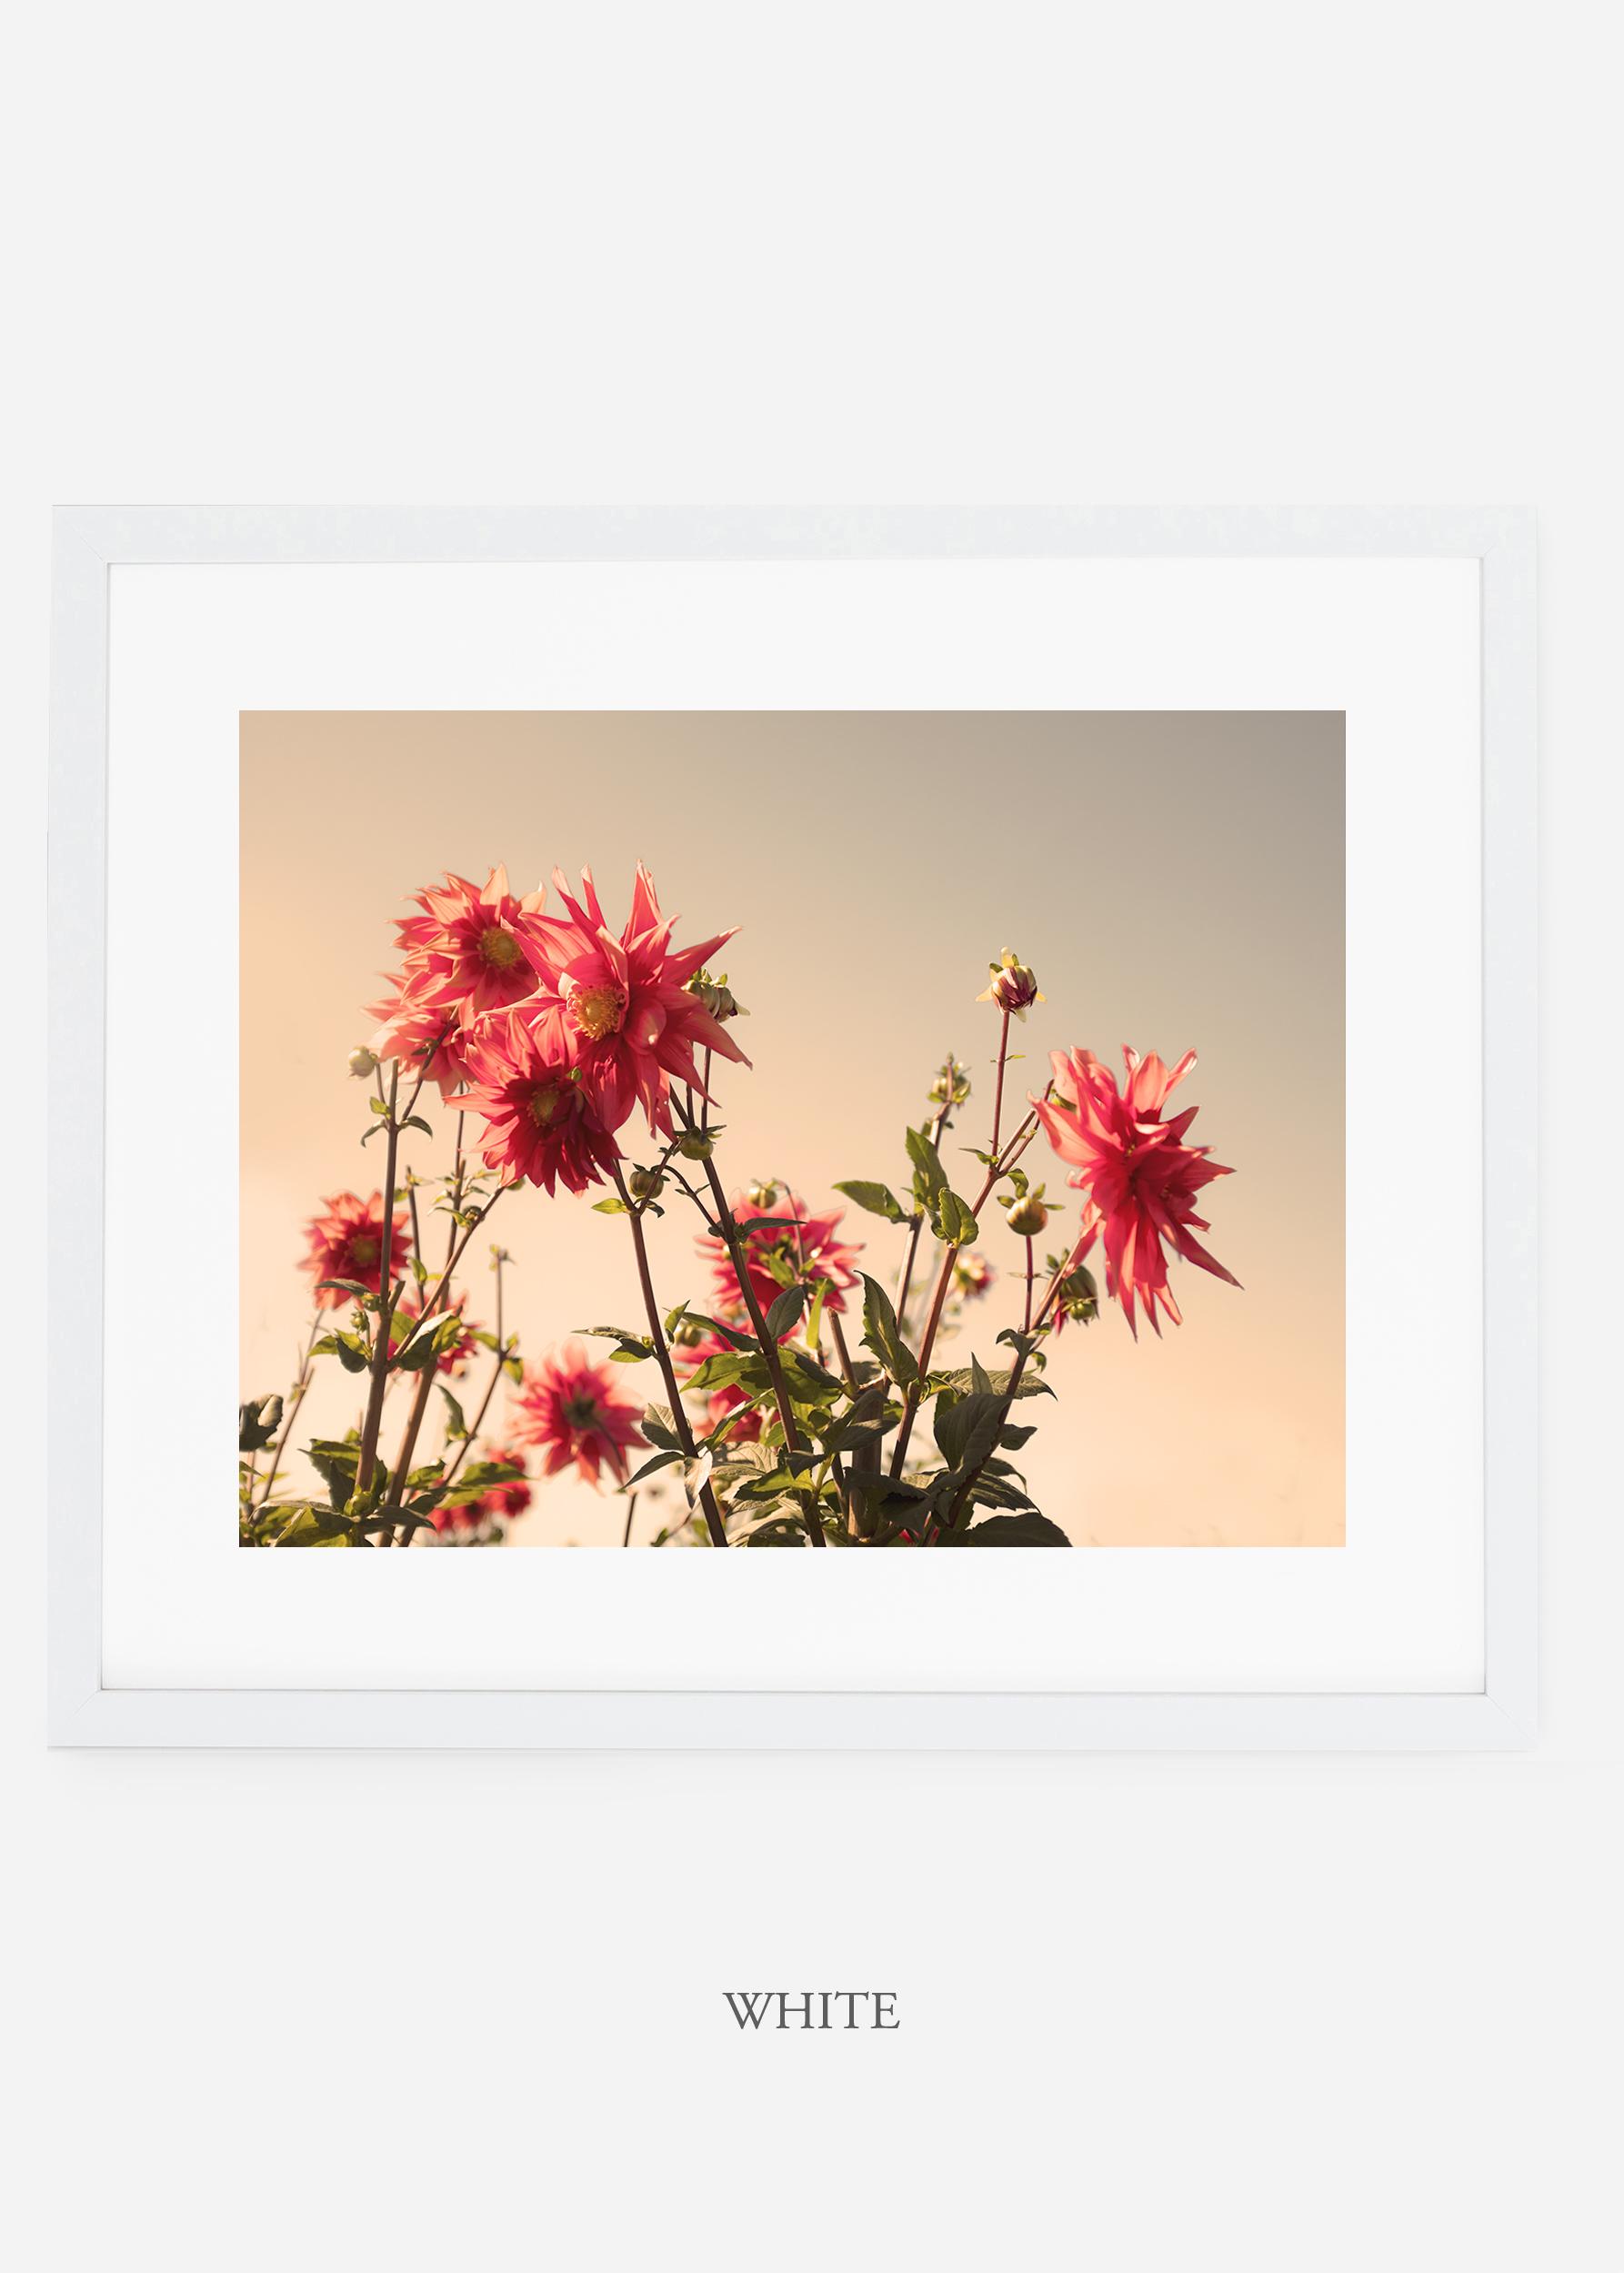 wilder-california-whiteframe-dahlia-9-minimal-botanical-print-art-interior-design.jpg